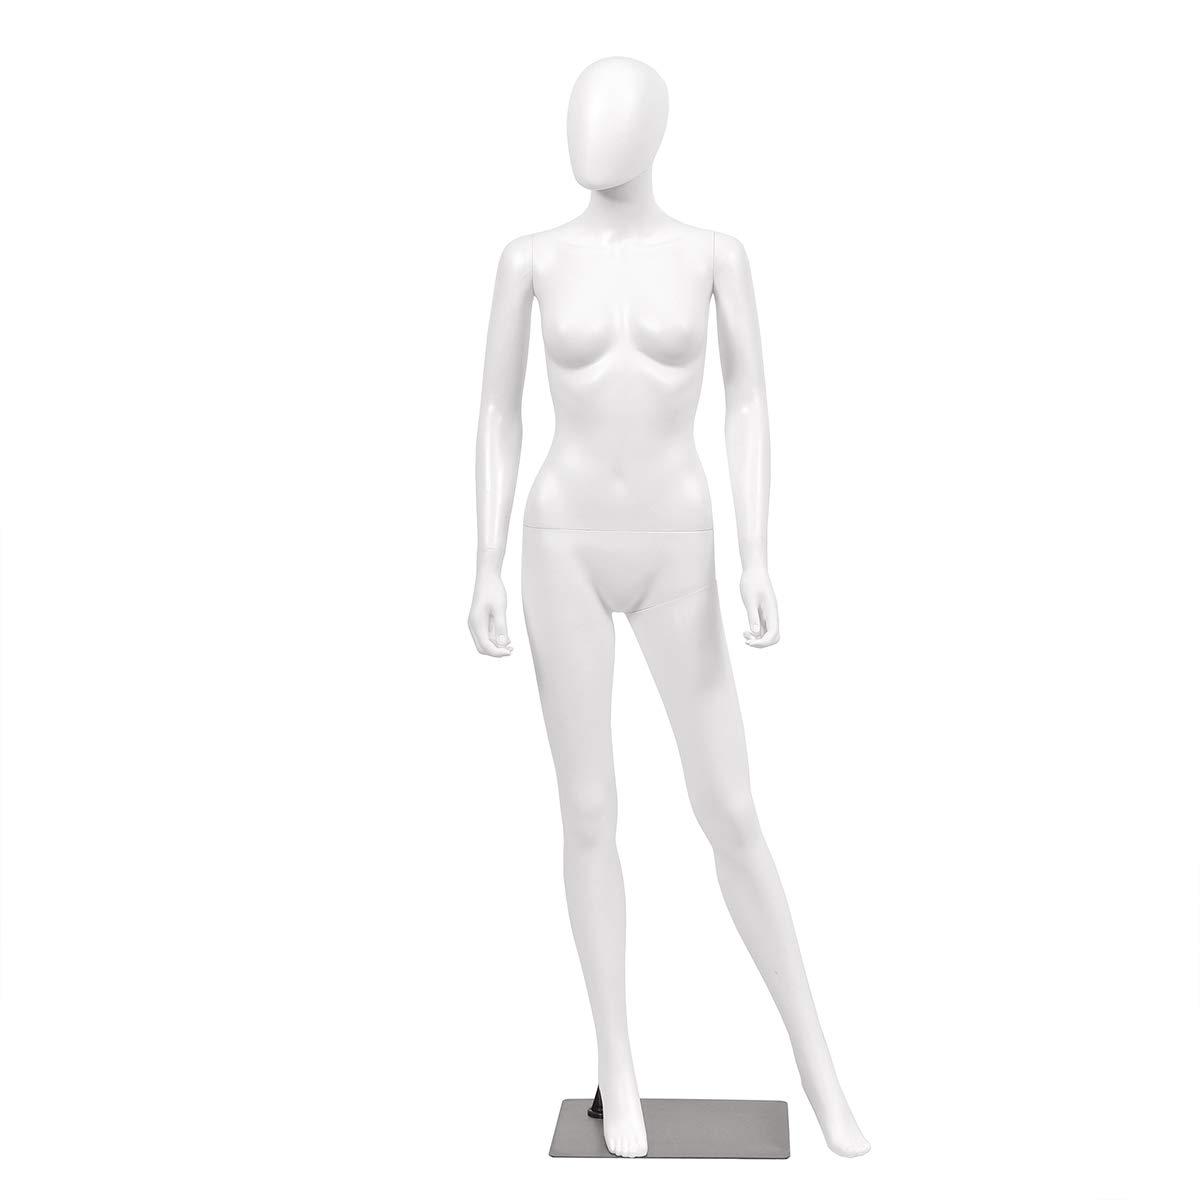 Giantex 5.8 FT Female Mannequin Egghead Manikin Metal Stand Plastic Full Body (White Style 2) by Giantex